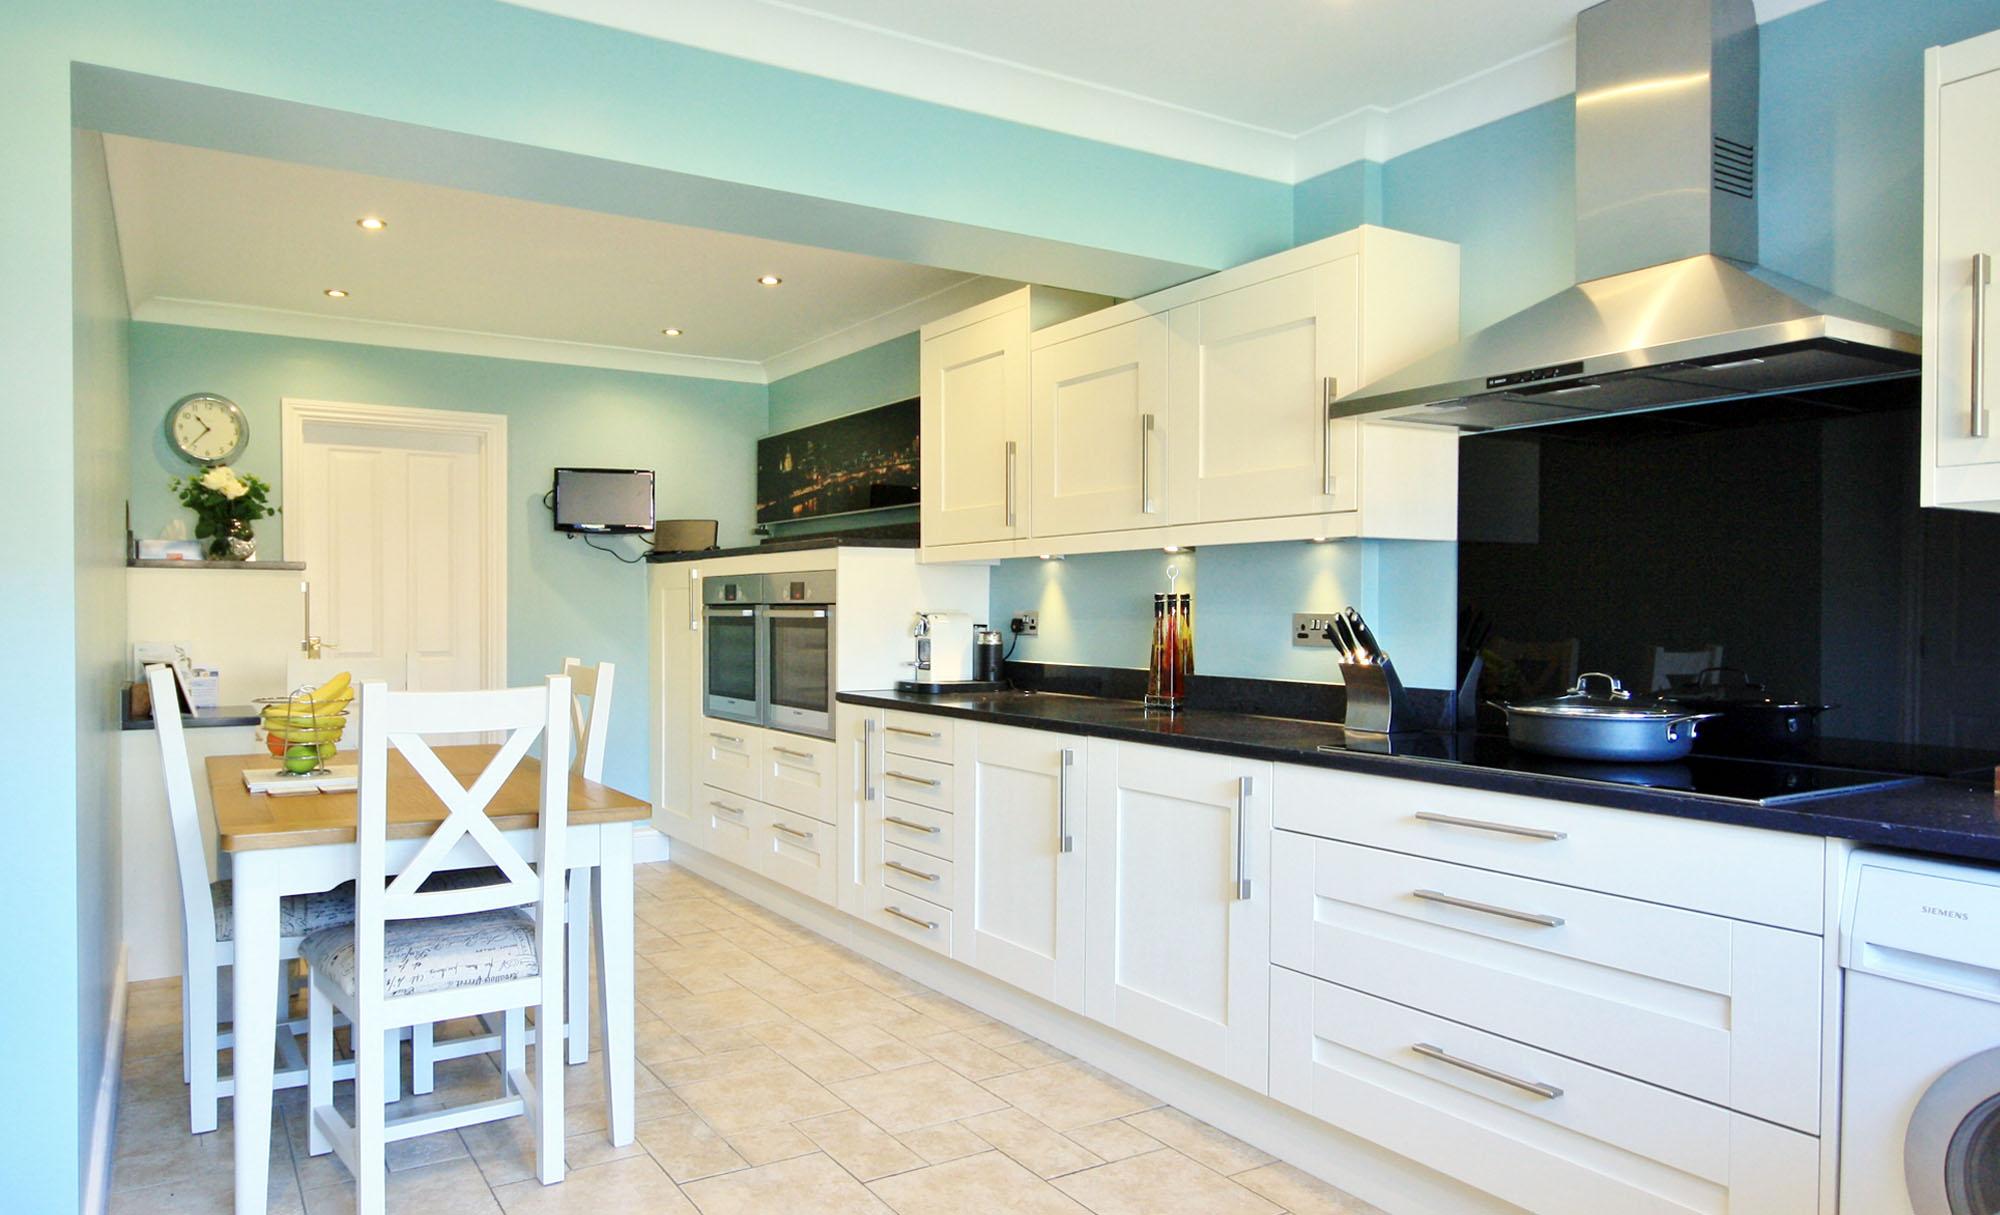 Windsor Shaker Ivory Kitchen For Mr U0026 Mrs Nel Of Chelmsford ... Part 85